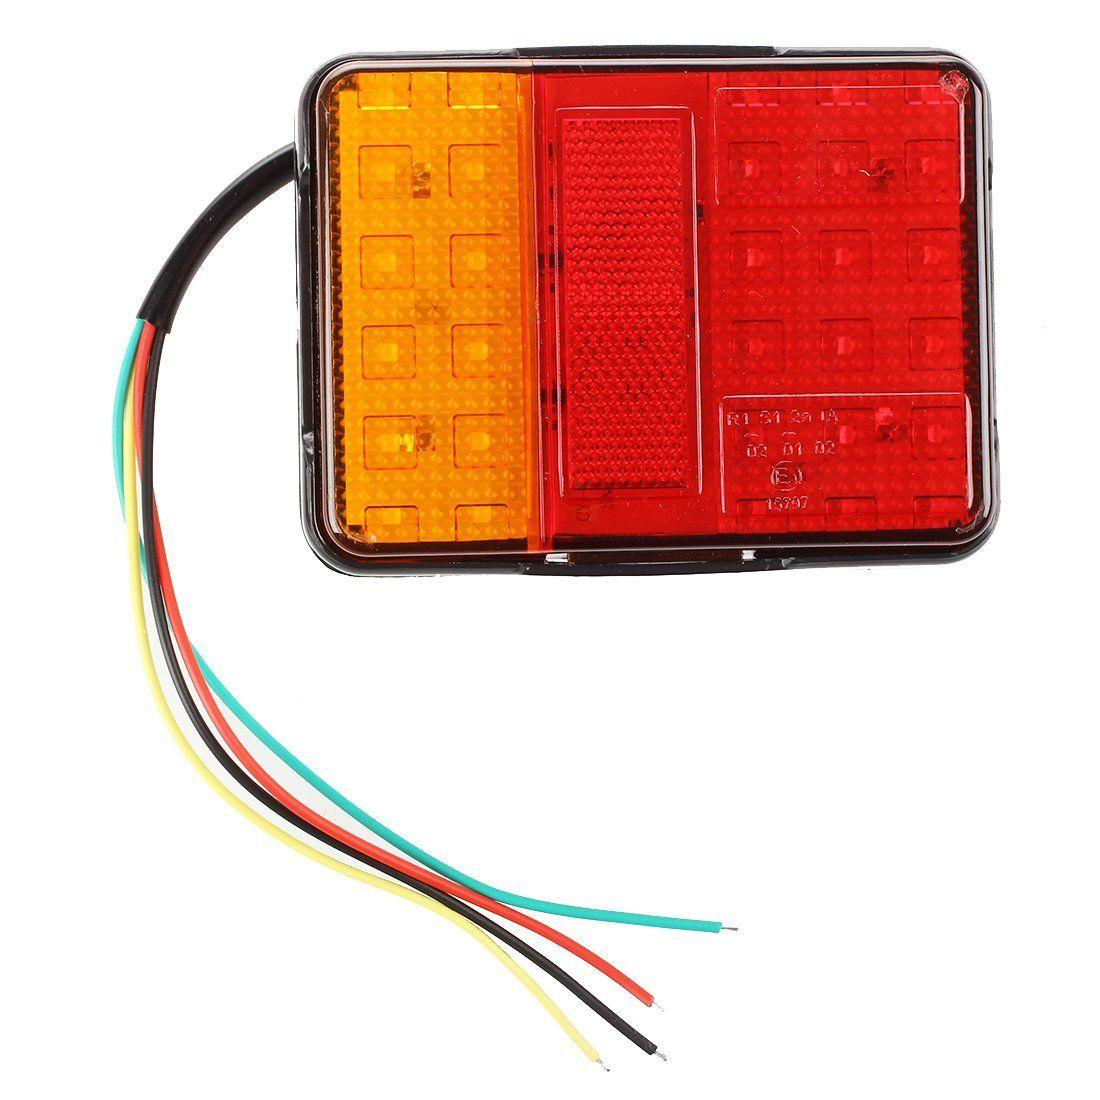 2x 30 LED Impermeabile 2W Tail Rear Light Lampada rossa / gialla barca rimorchio